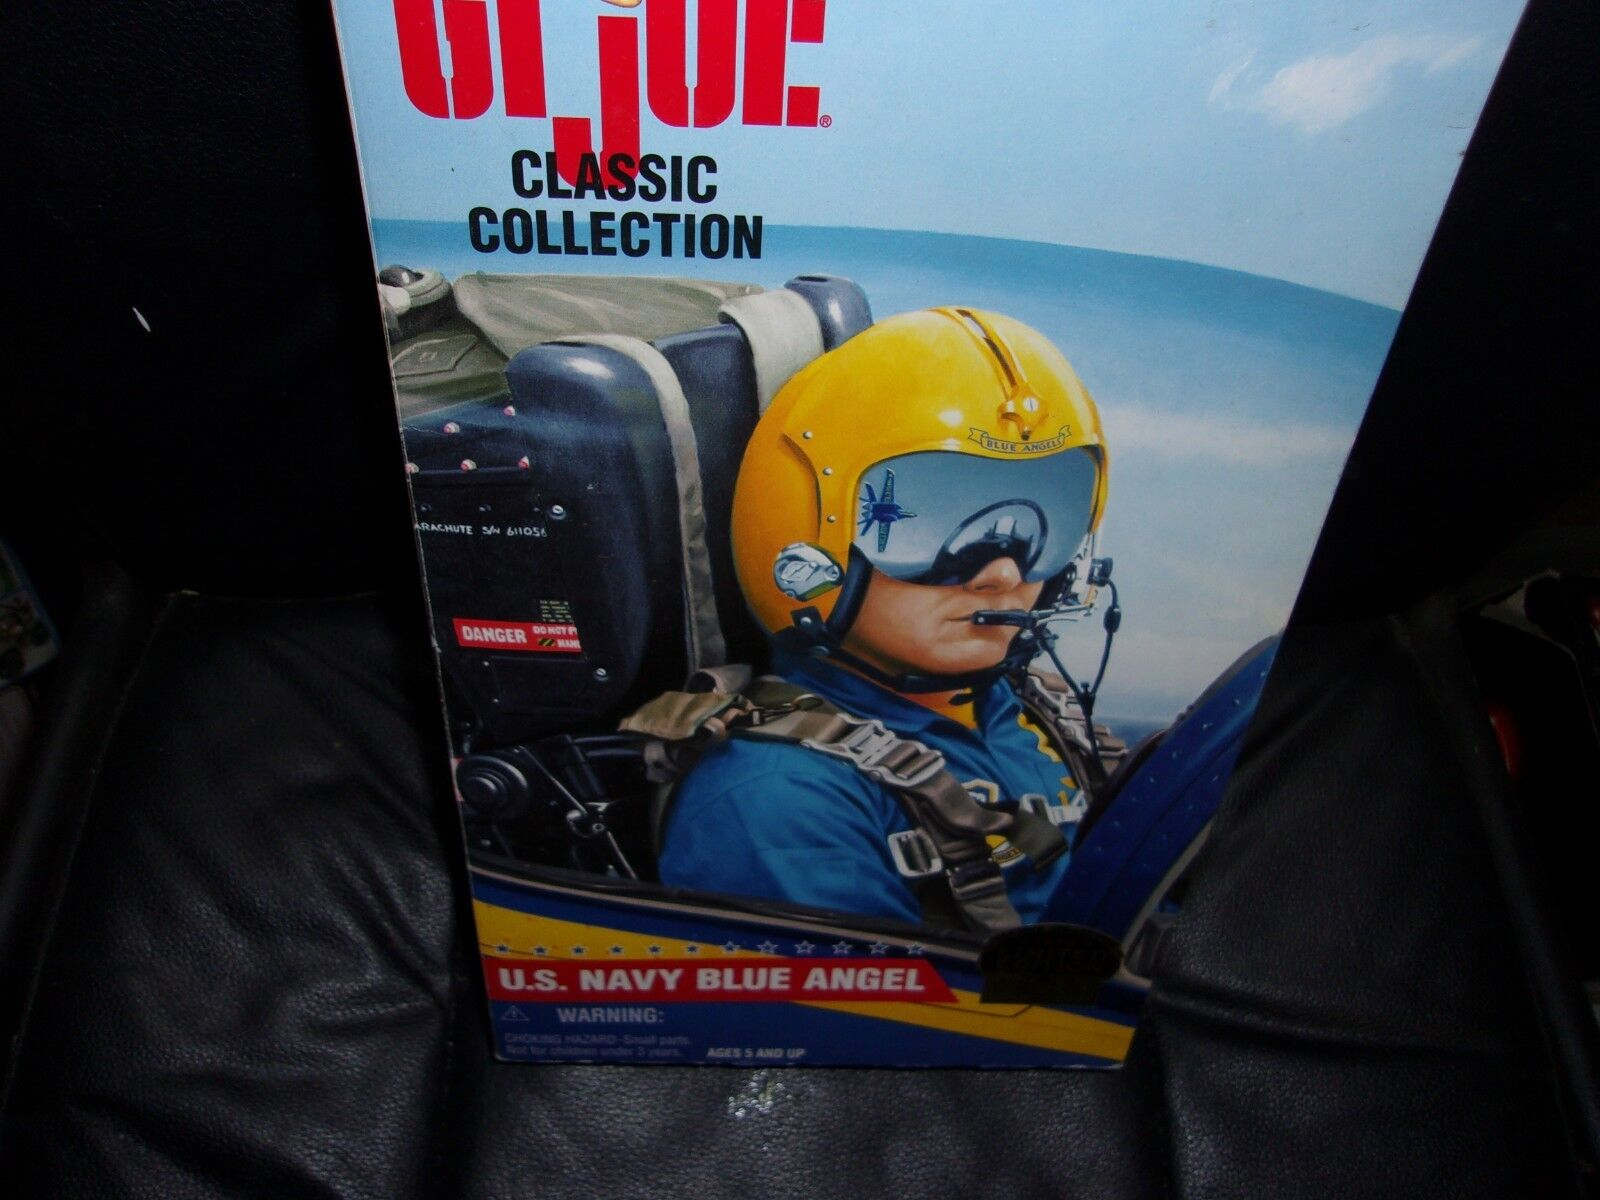 GI JOE U.S. NAVY NAVY NAVY blueE ANGEL b8b0c5